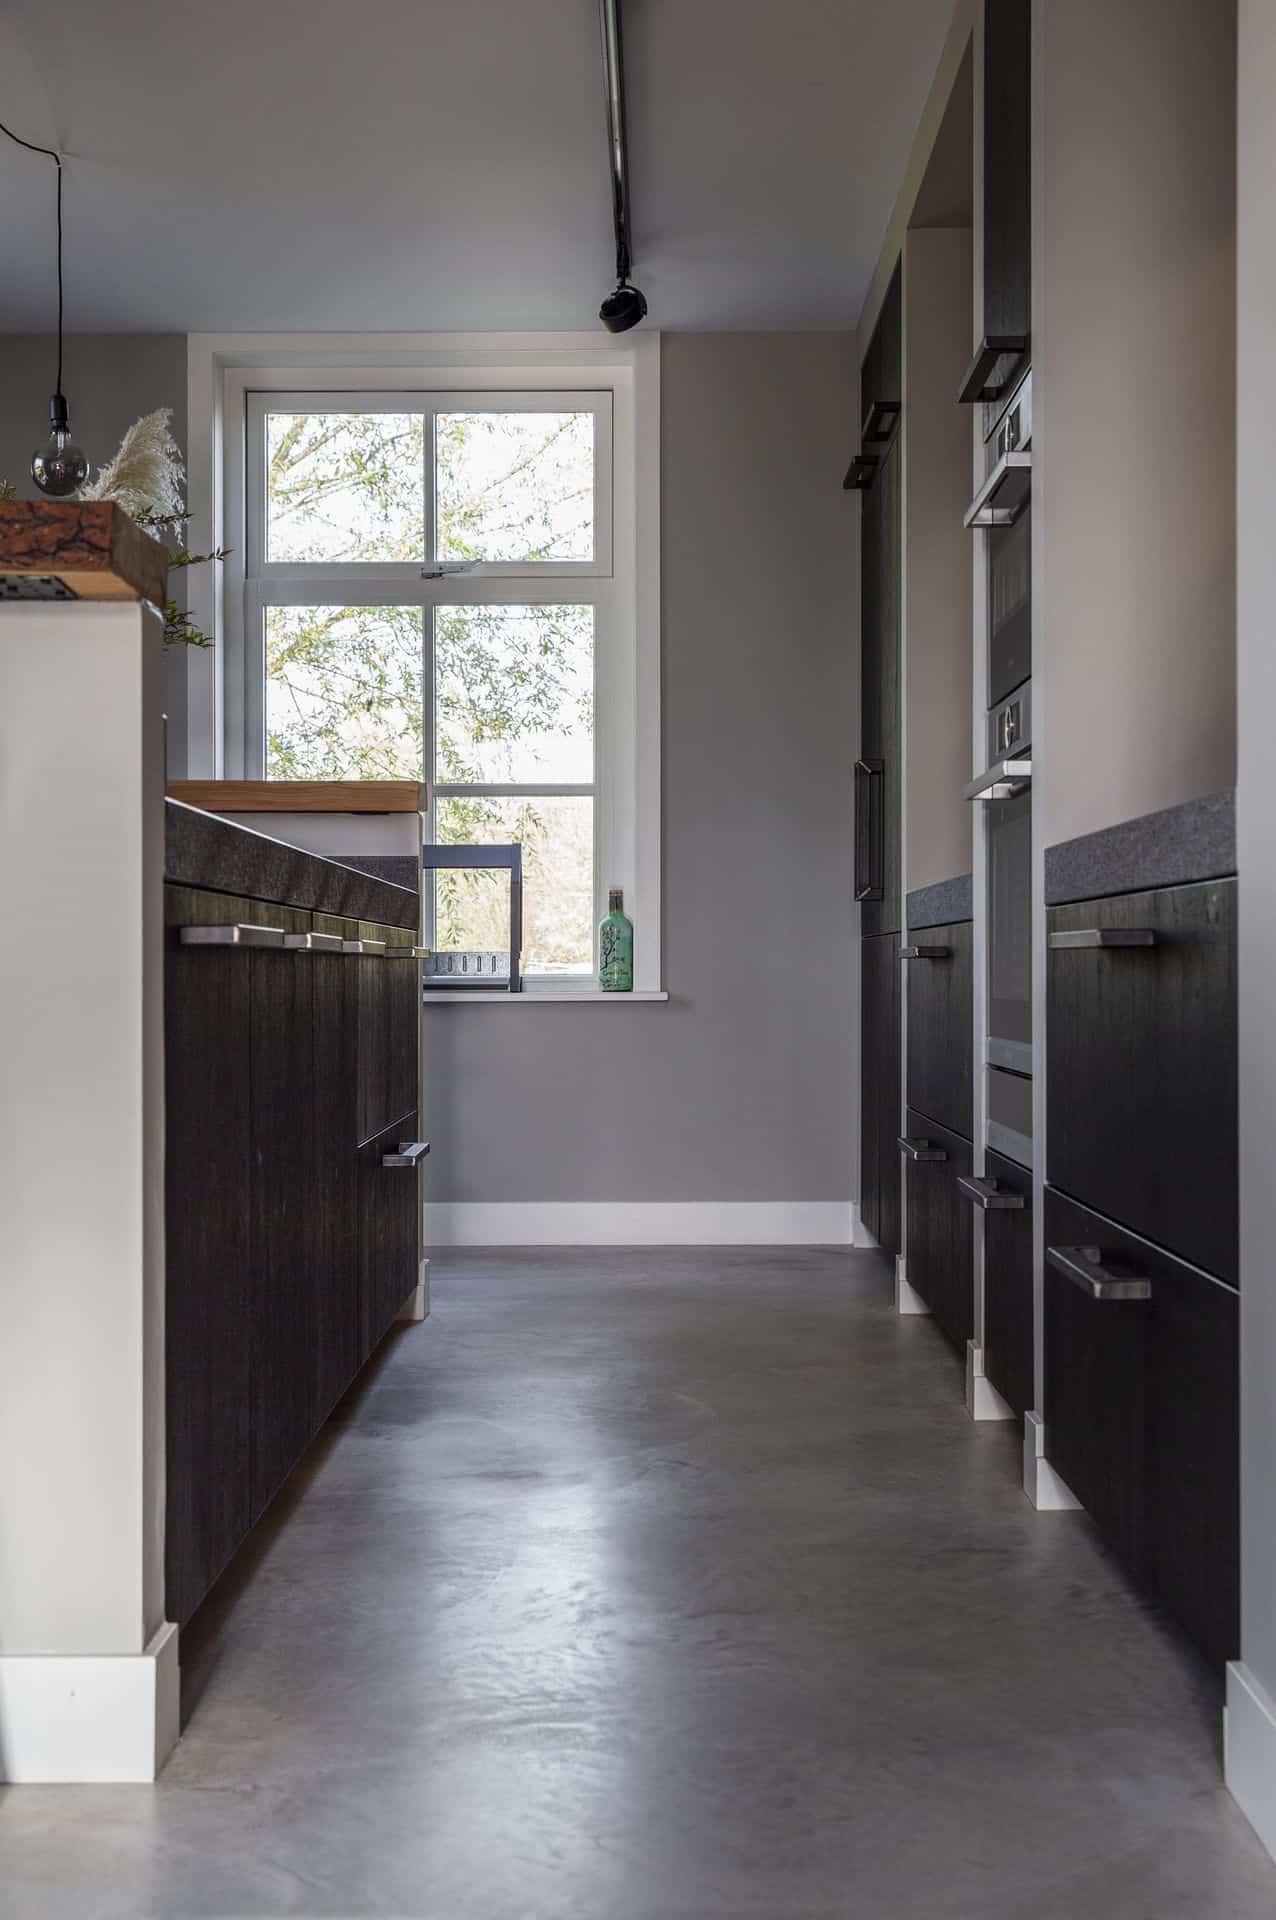 betonvloer keuken, zwarte keuken met beton